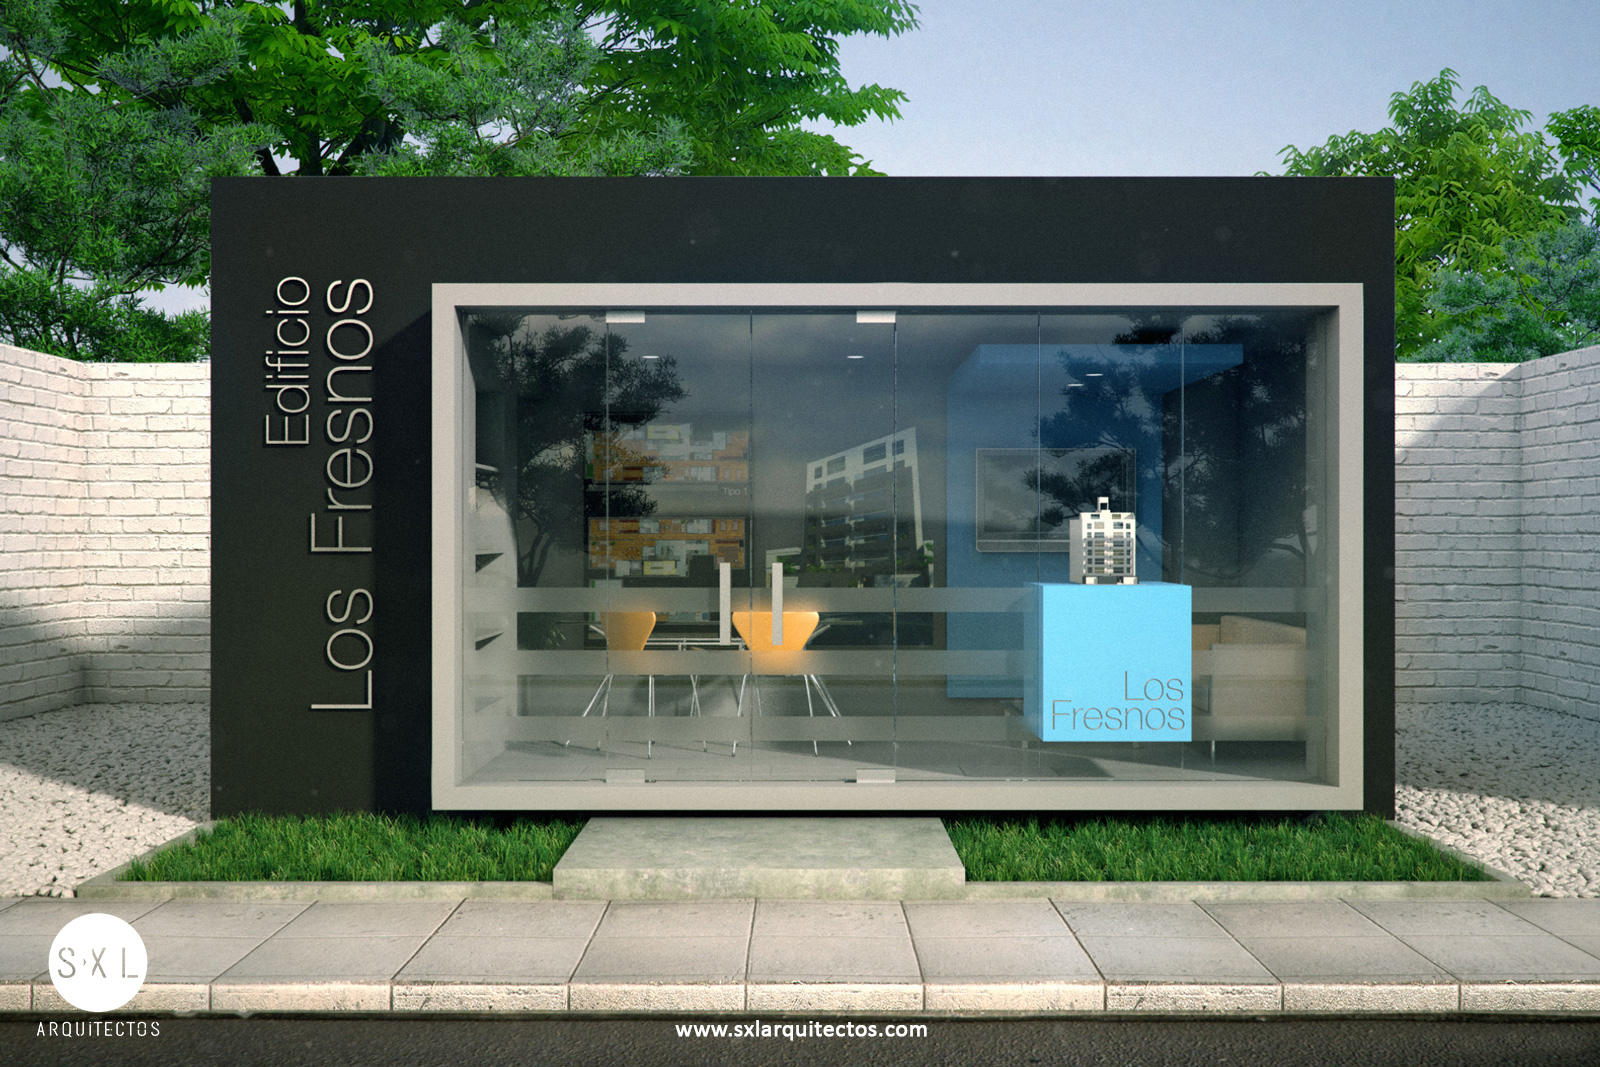 S xl arquitectos - Caseta de plastico para jardin ...